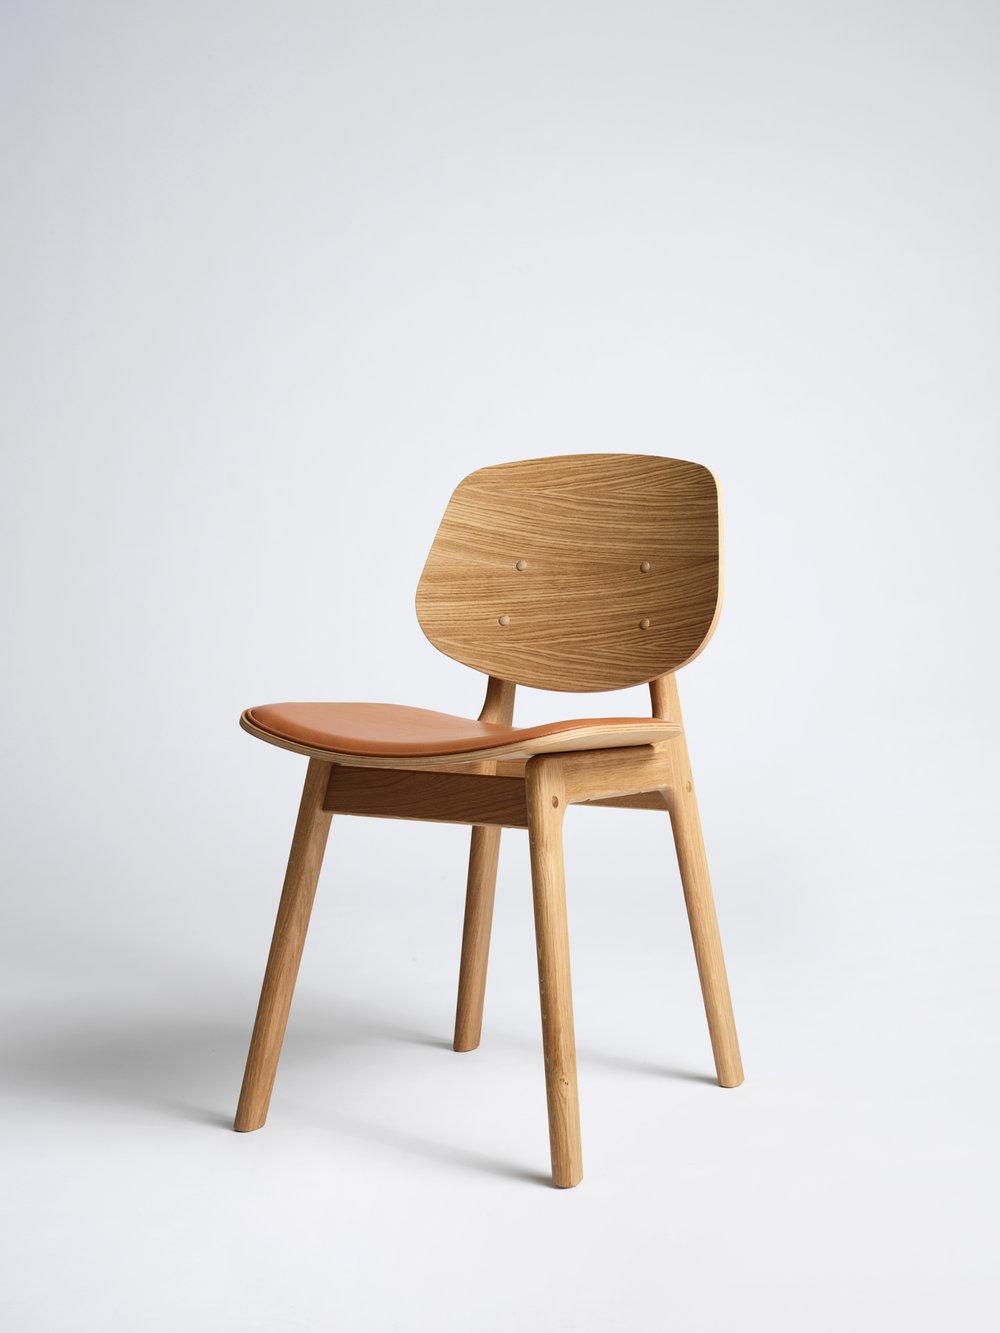 Pandora_Chair_7662.jpg